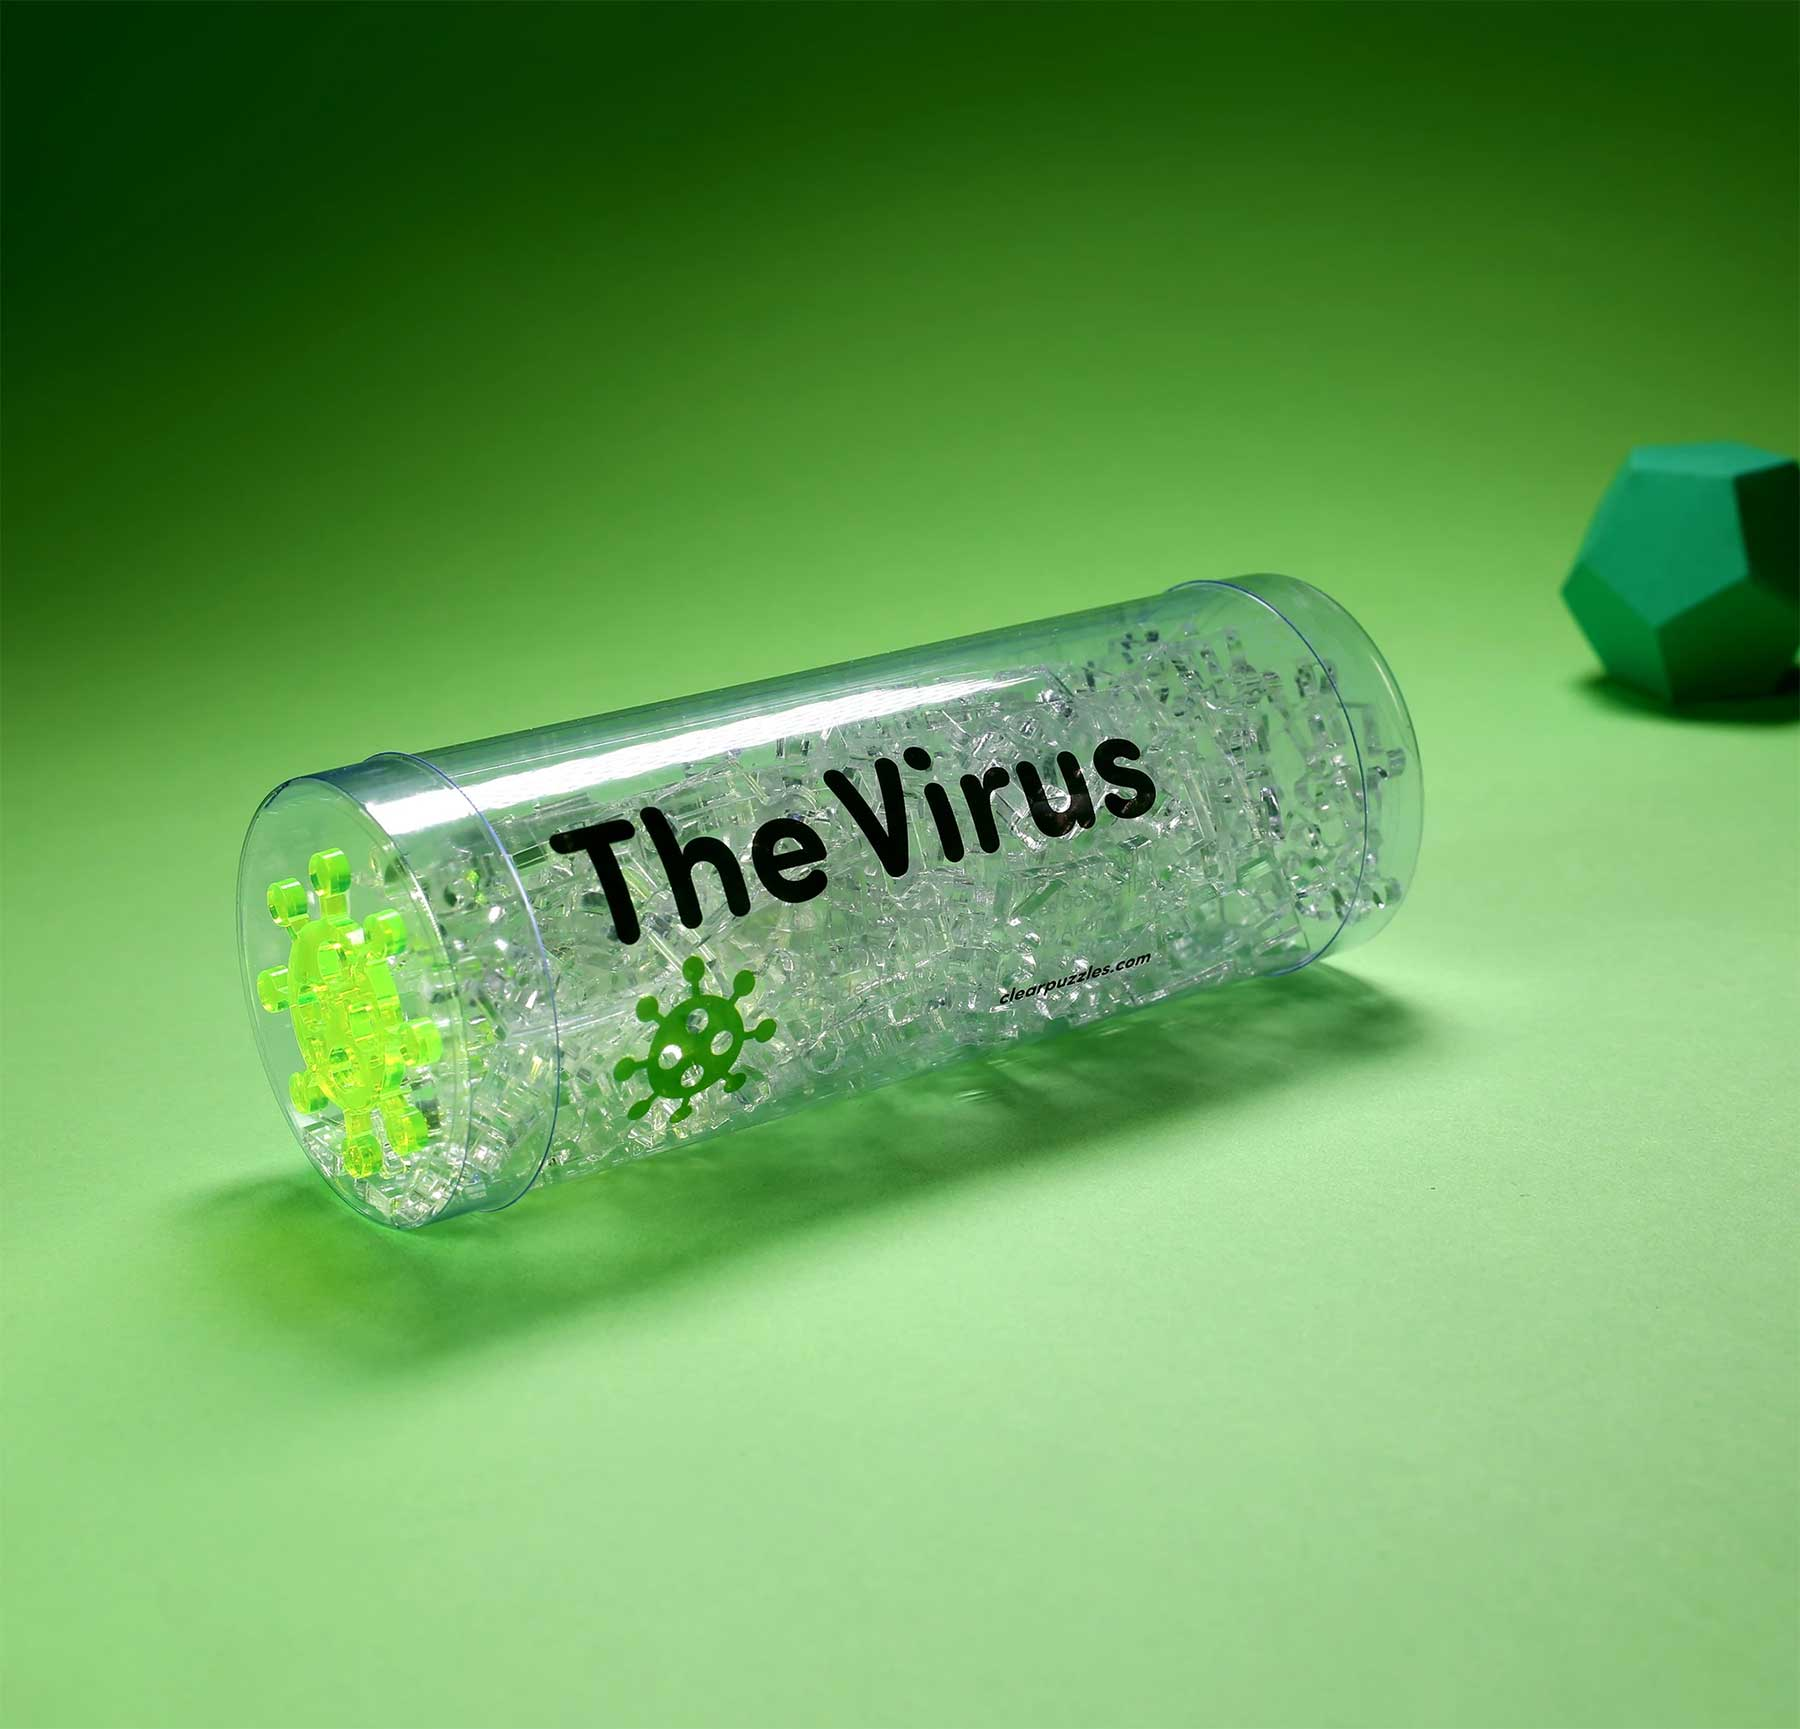 Durchsichtiges Puzzle puzzle-aus-glas-The-virus_clear-jigsaw_03